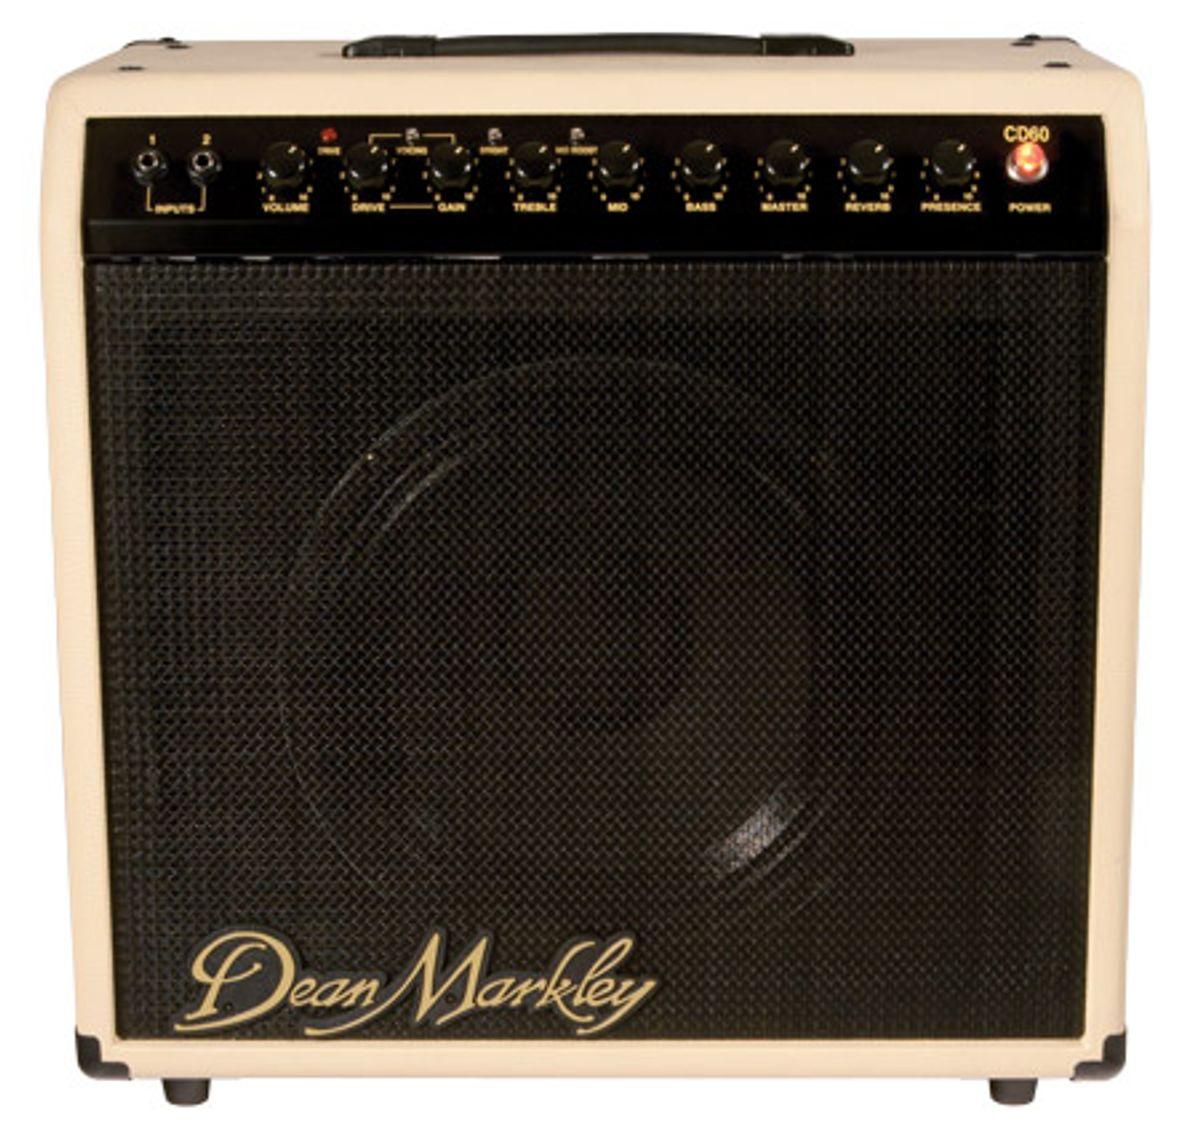 Dean Markley CD60 Amp Review